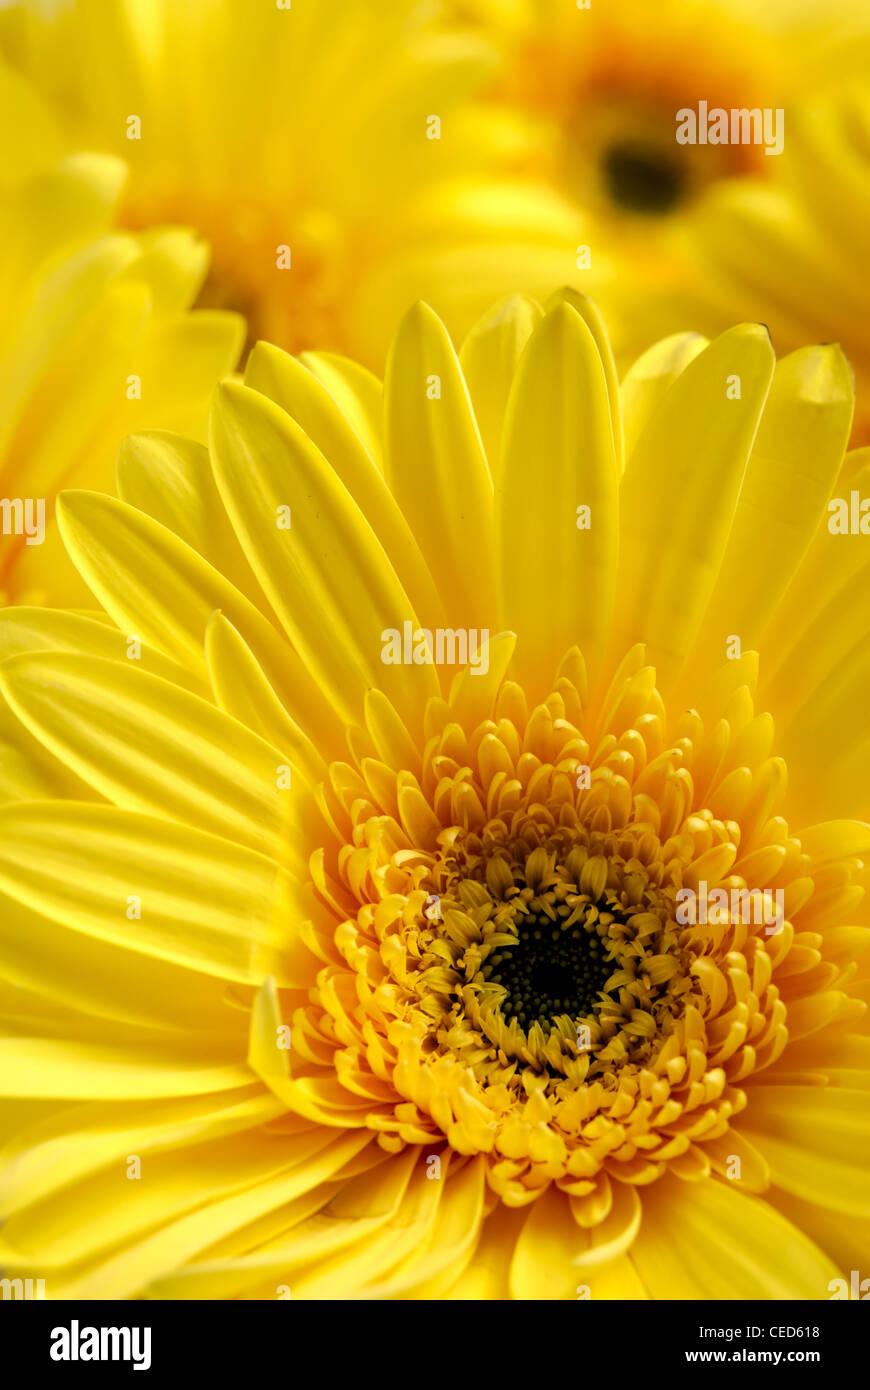 Yellow flowers background - Stock Image